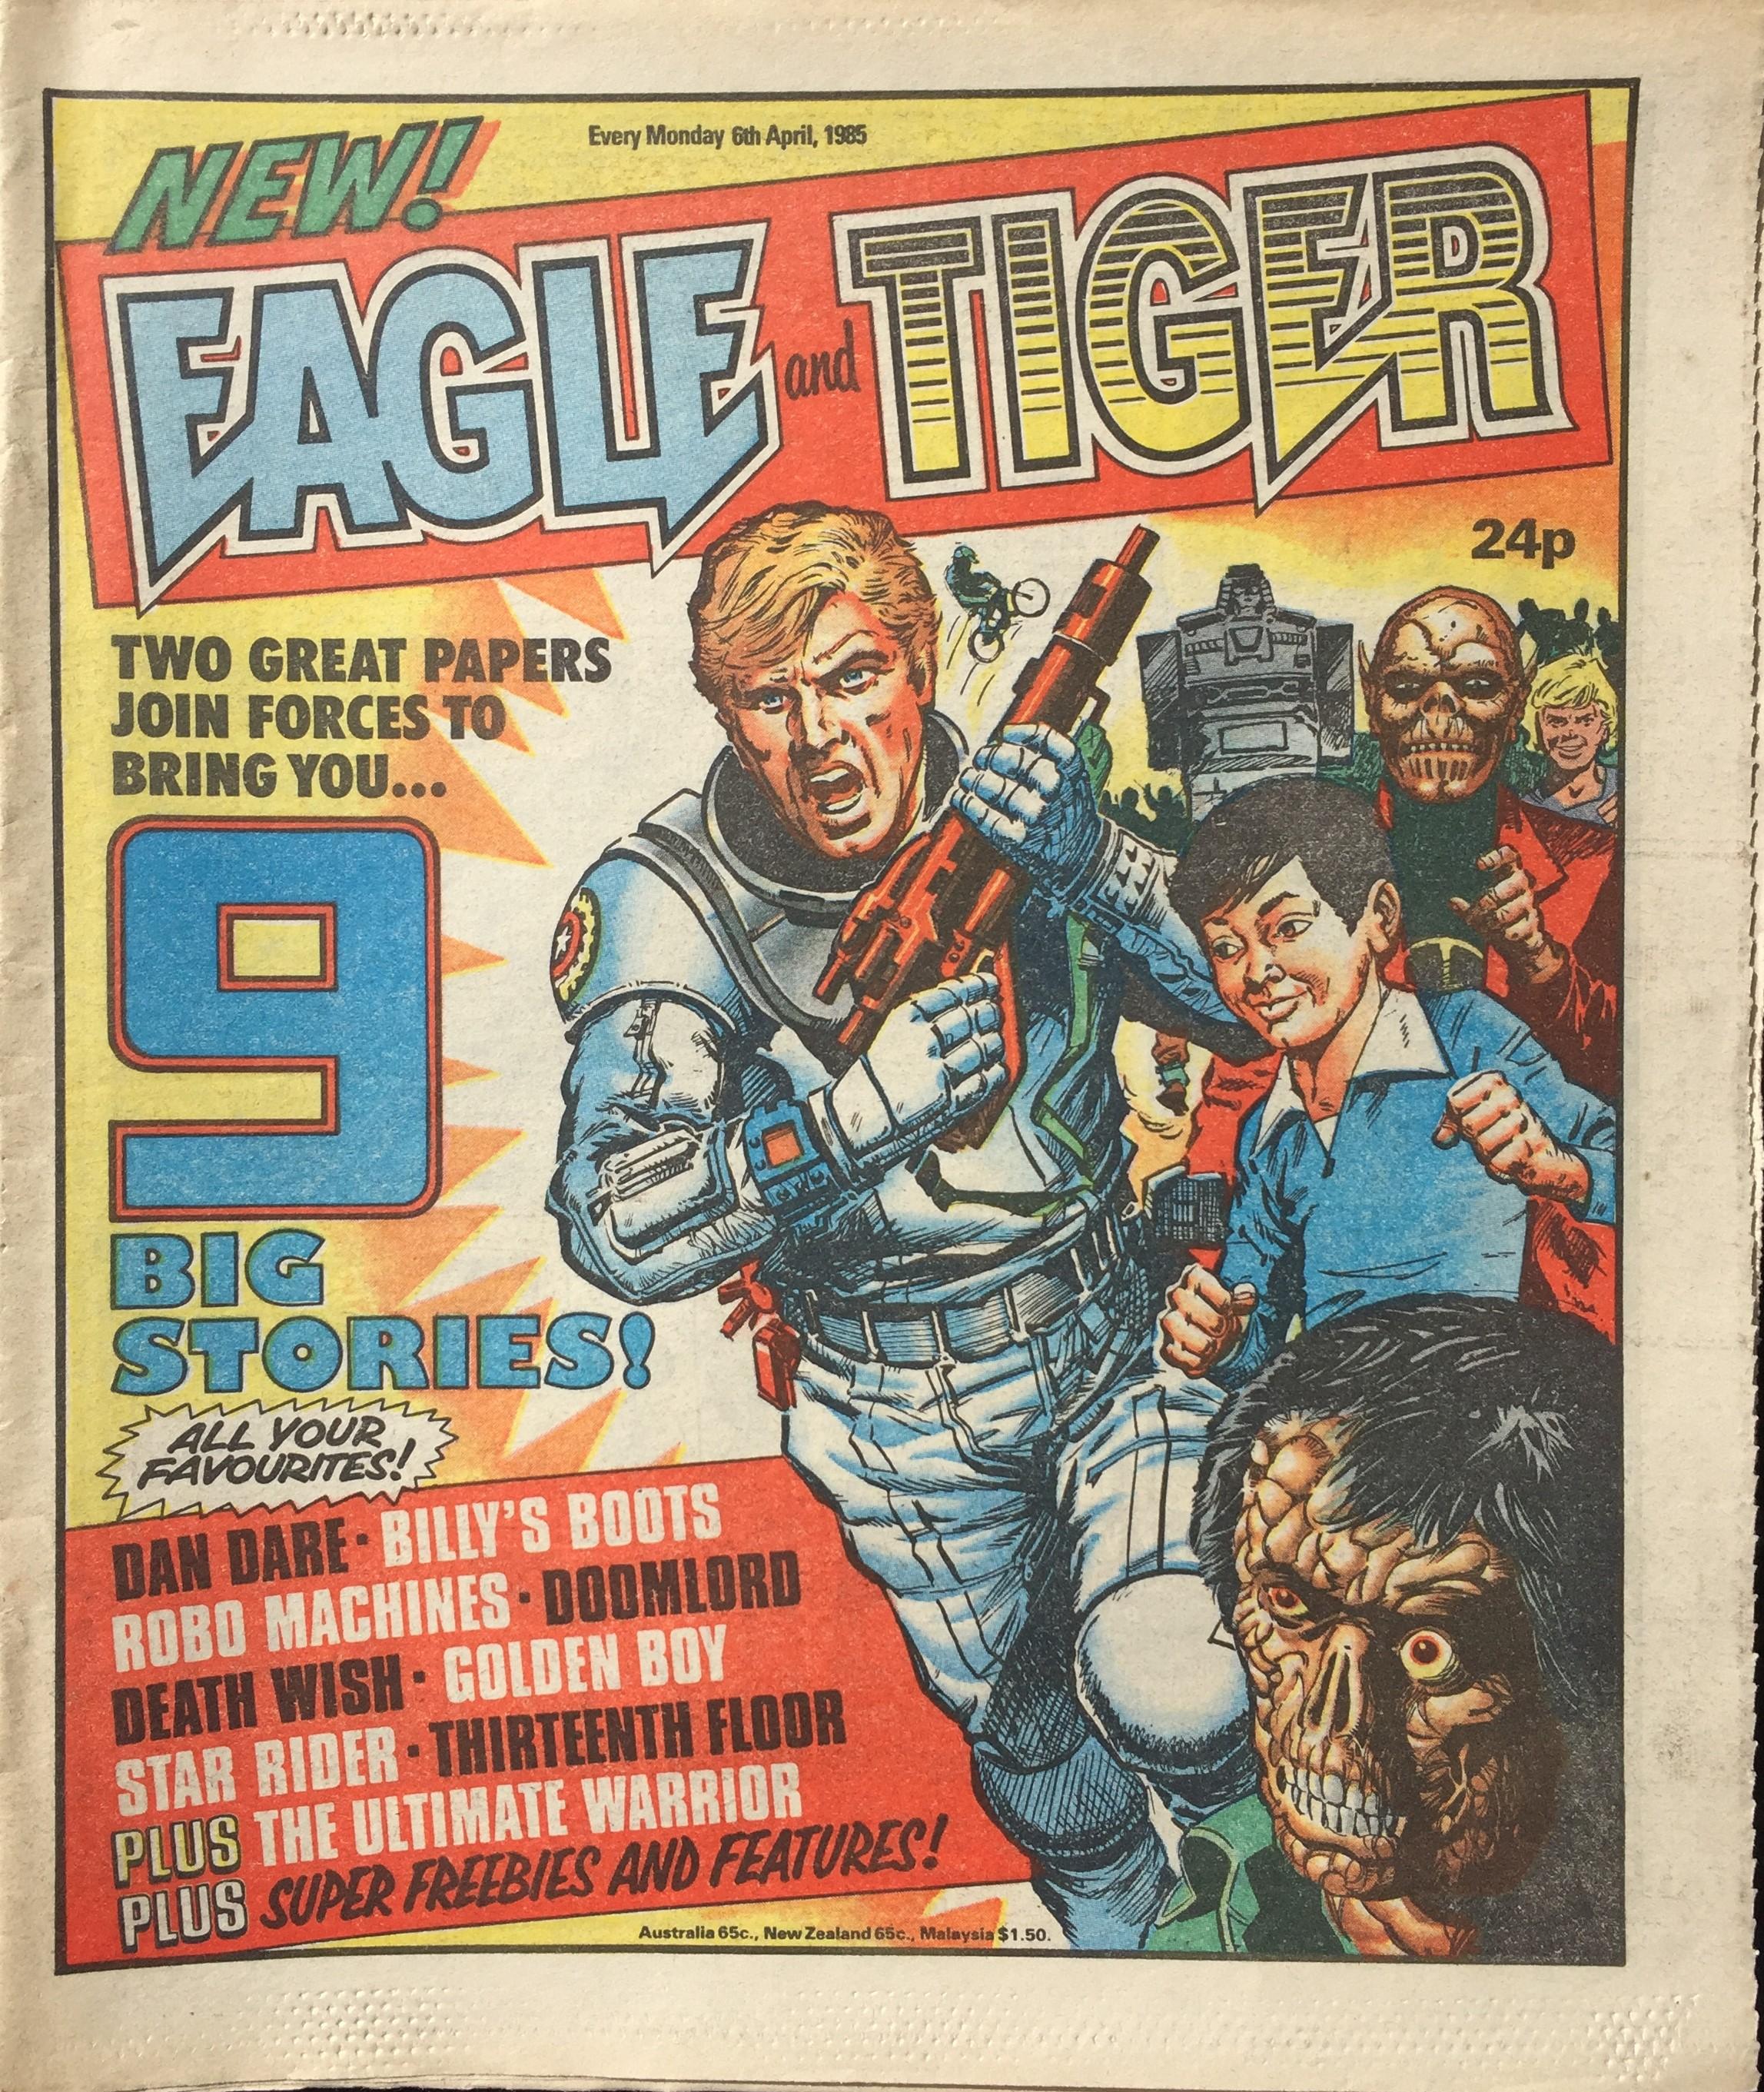 Cover artwork: Eric Bradbury?